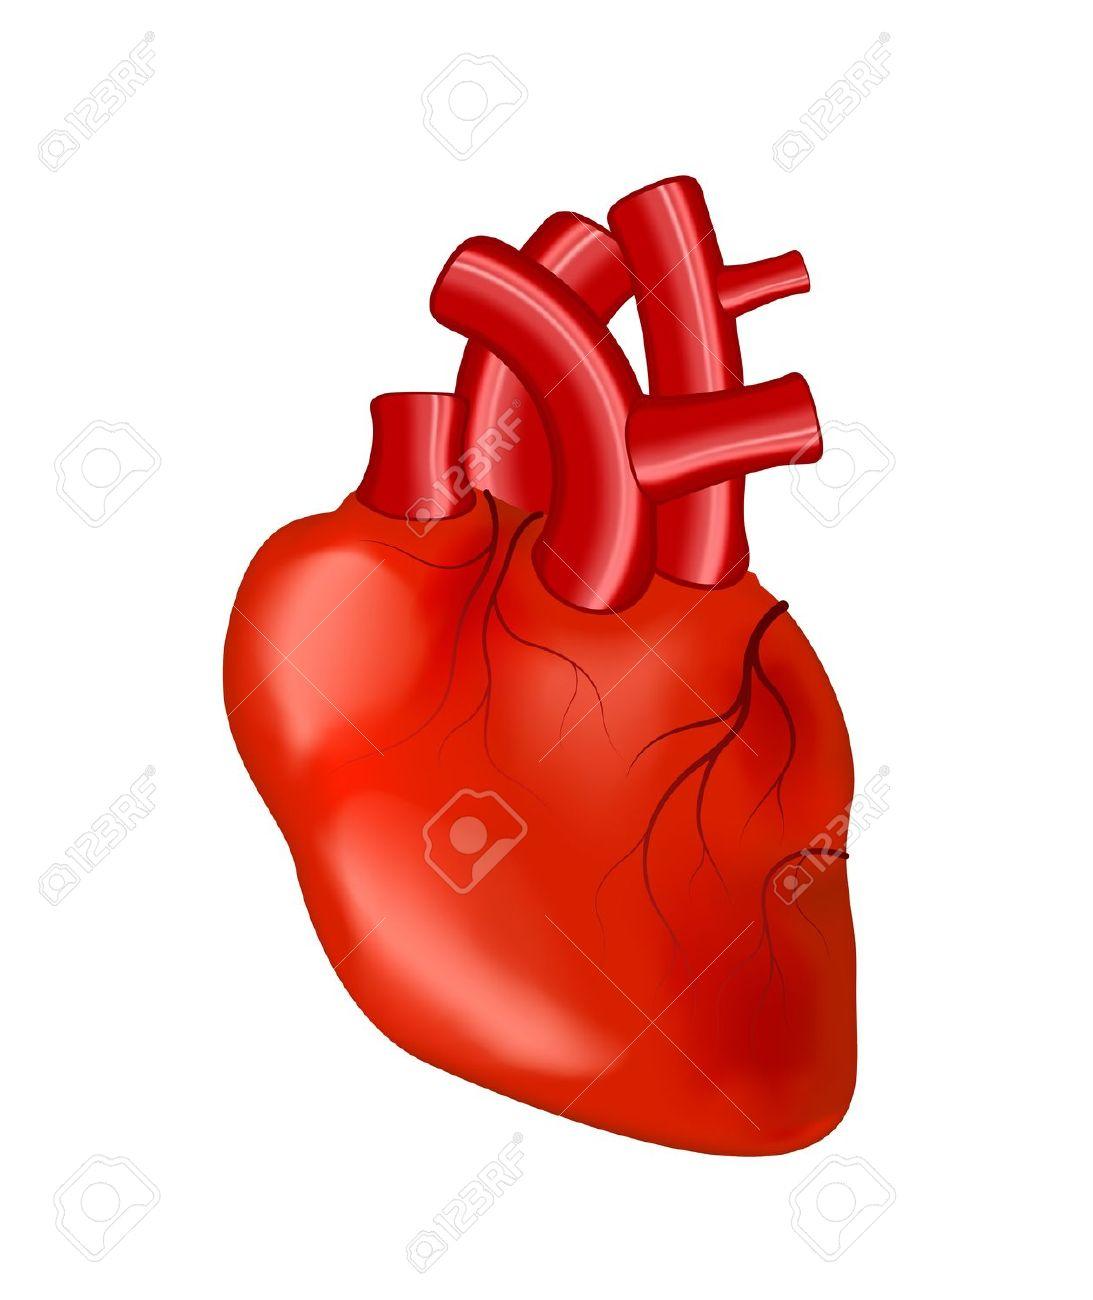 1093x1300 Anatomical Heart Cartoon Anatomical Human Heart On White